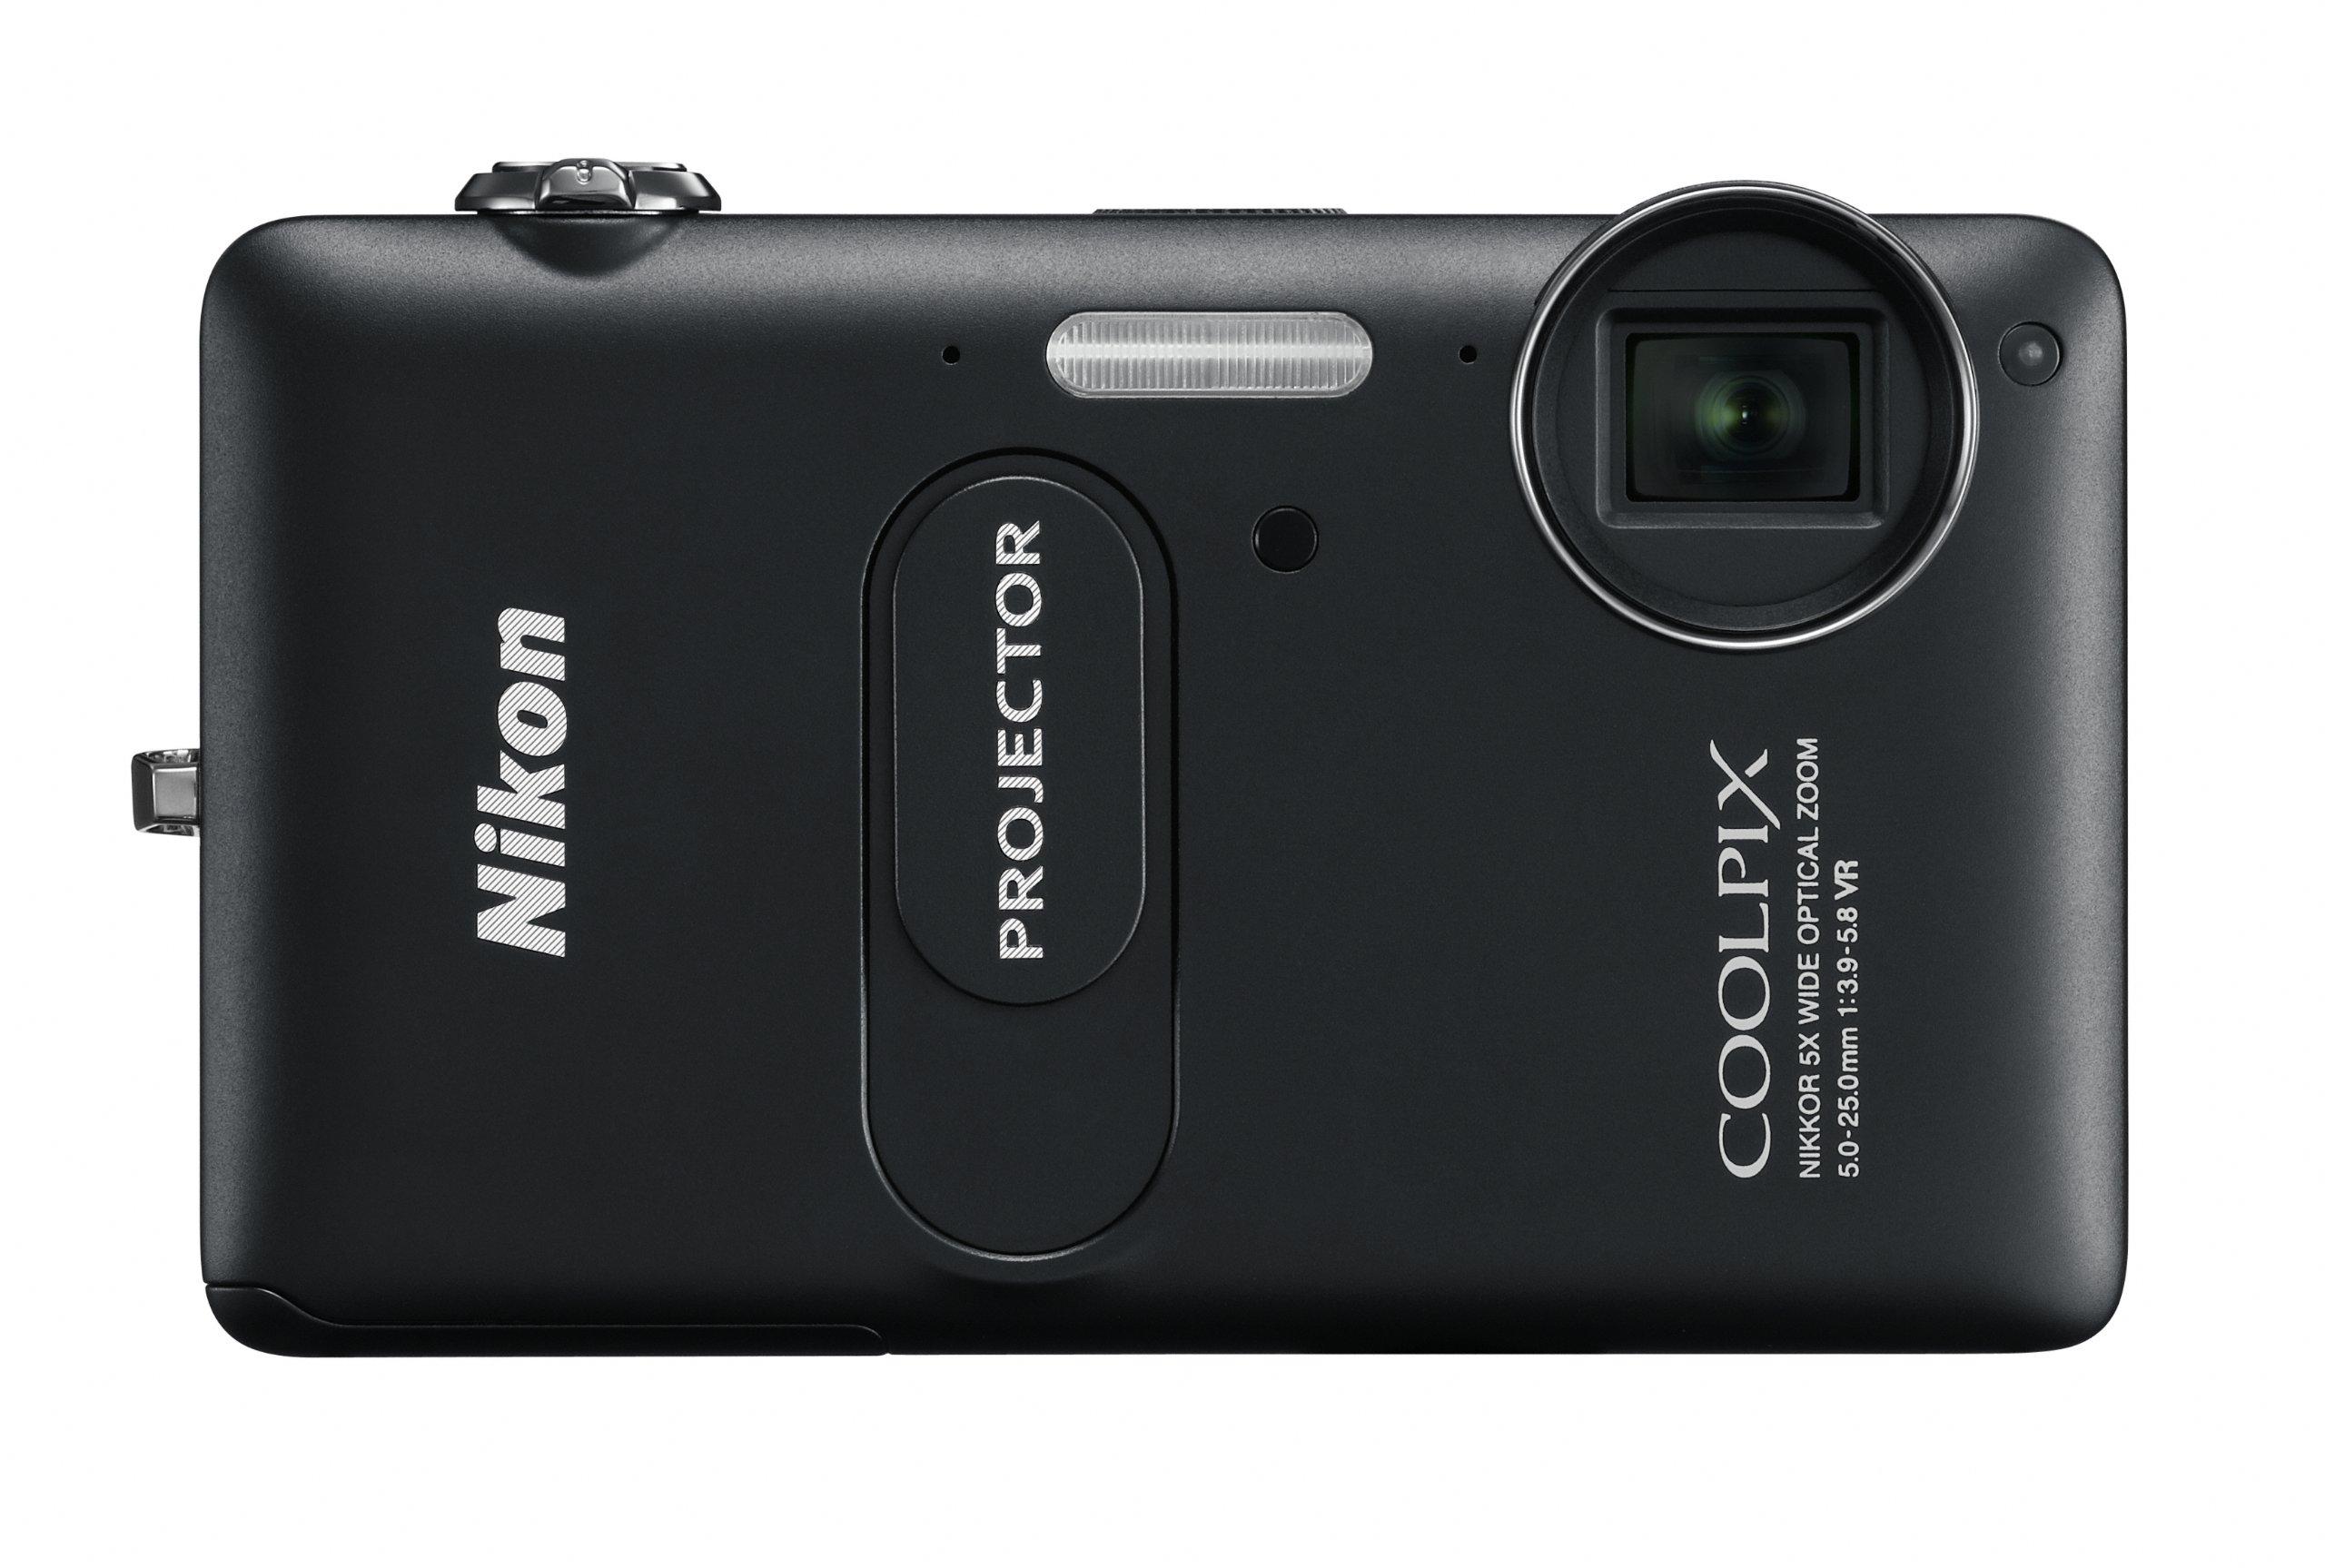 NIKON - Coolpix S1200pj Black 14.1-Megapixel Zoom Digital Camera with Built-In Projector